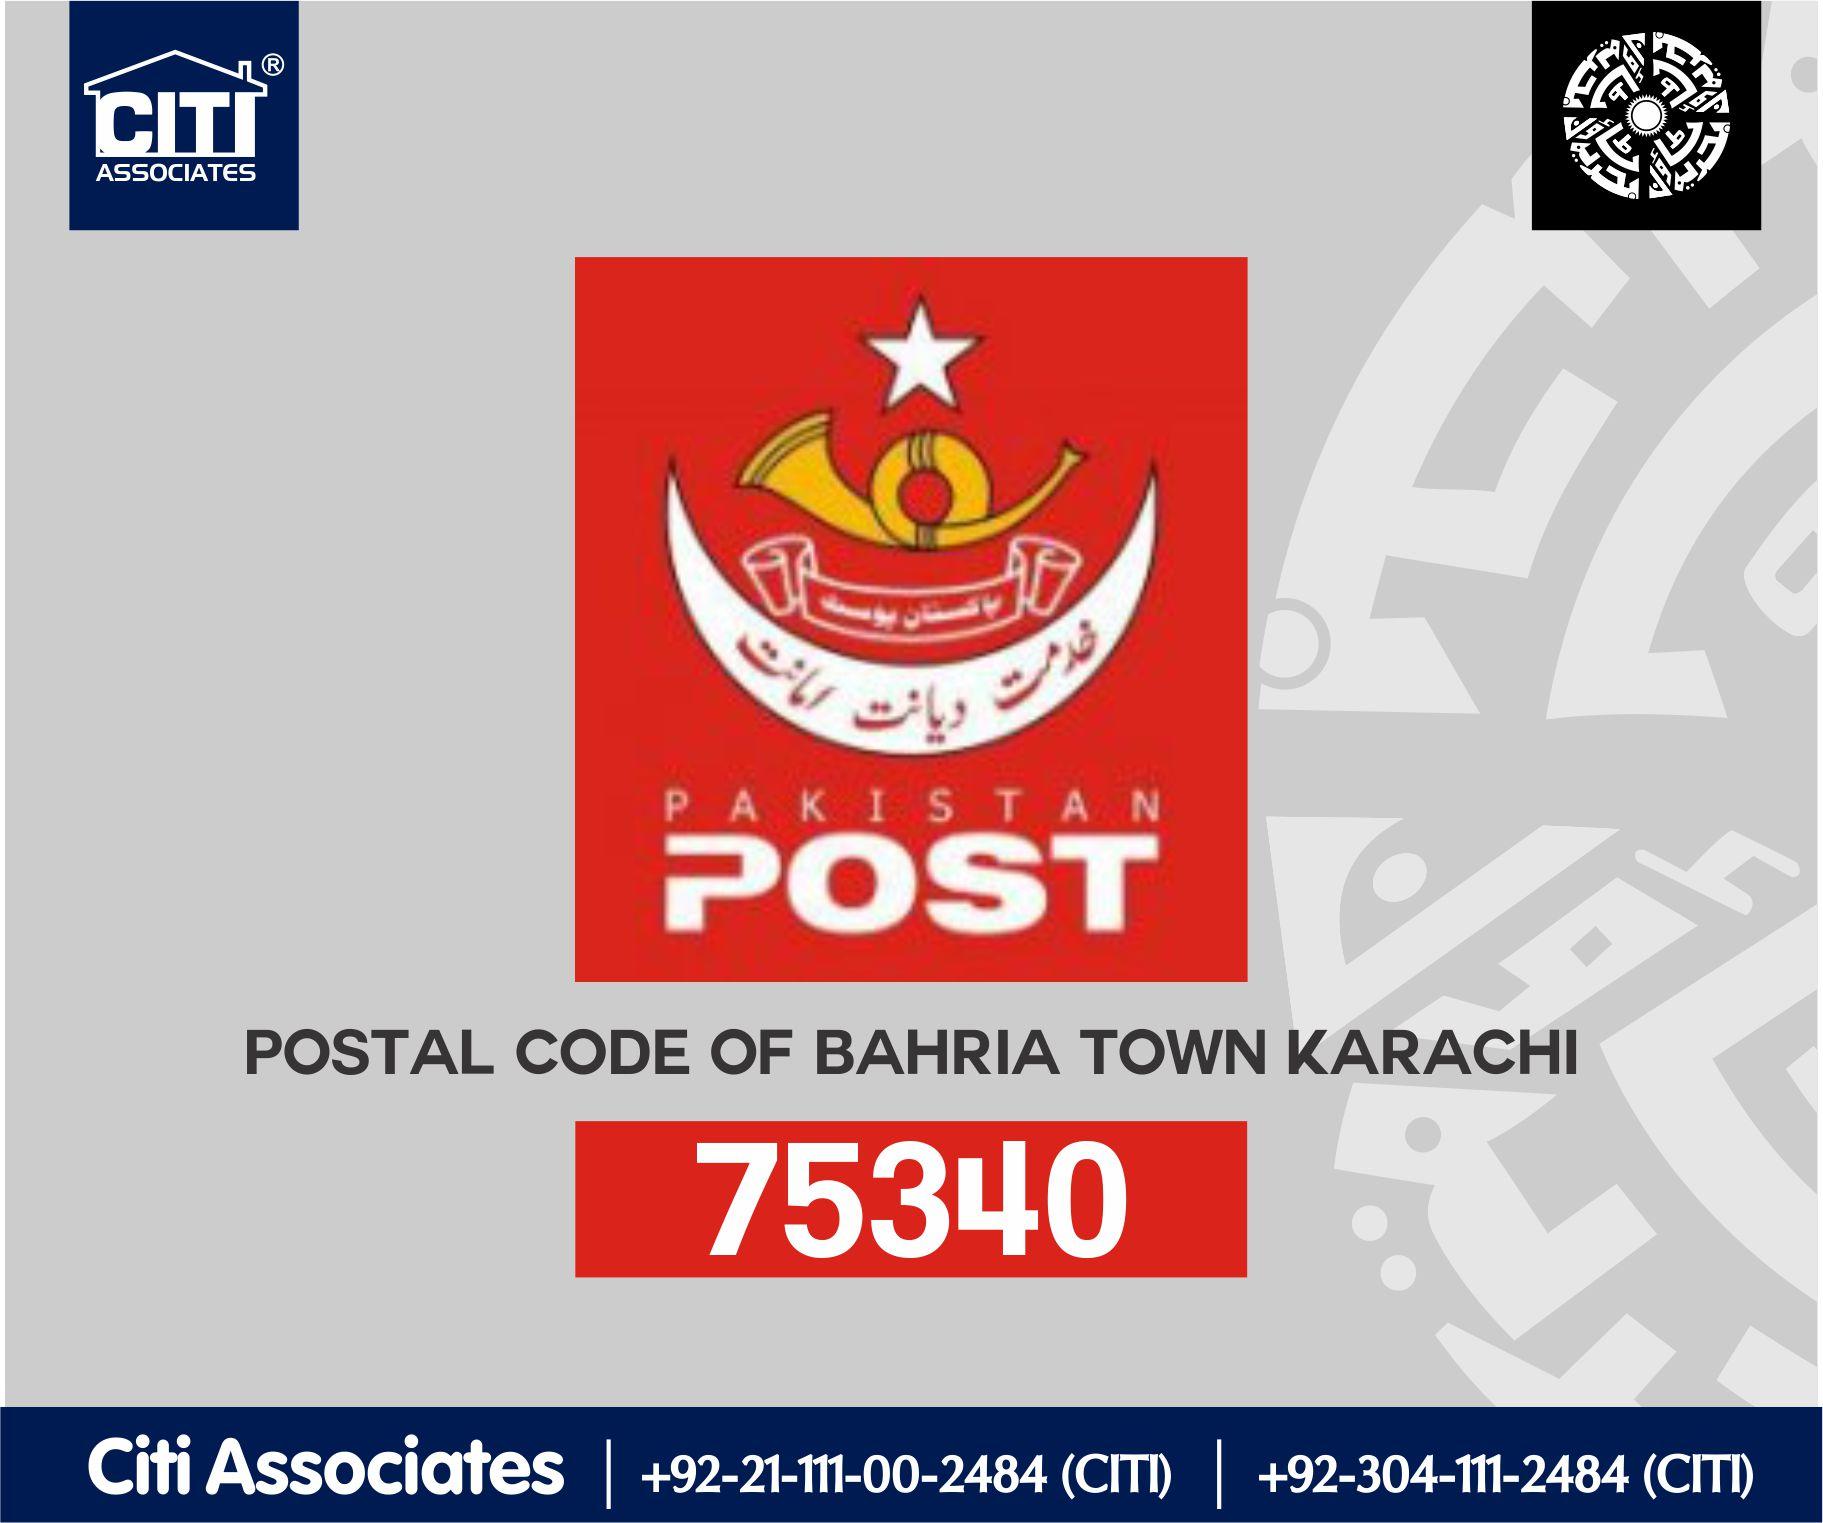 Postal Code of Bahria Town Karachi